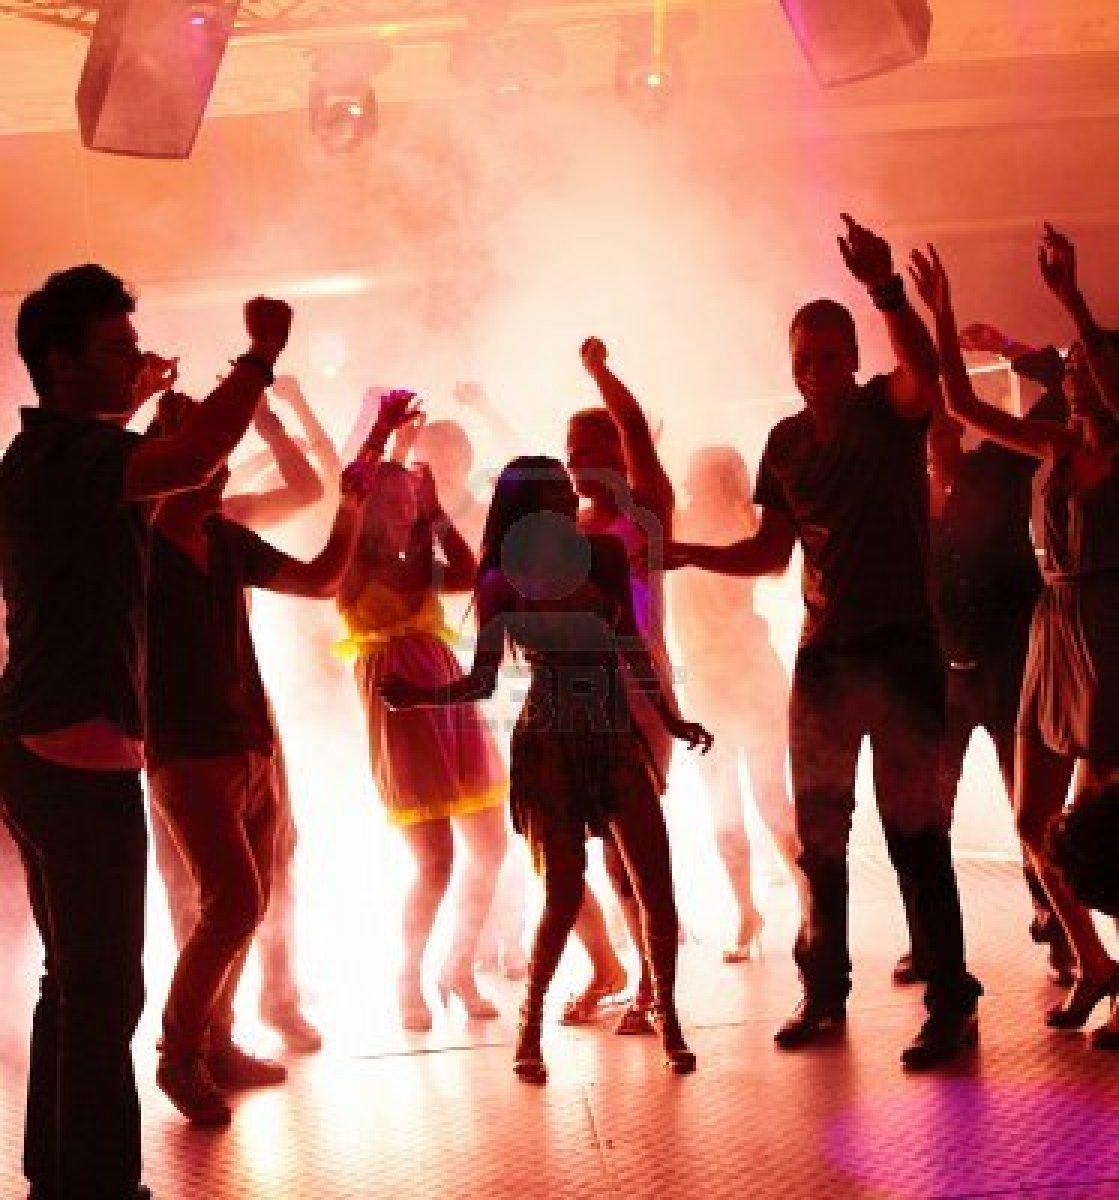 los molinos christian single men Meet single men in los molinos ca online & chat in the forums dhu is a 100% free dating site to find single men in los molinos.